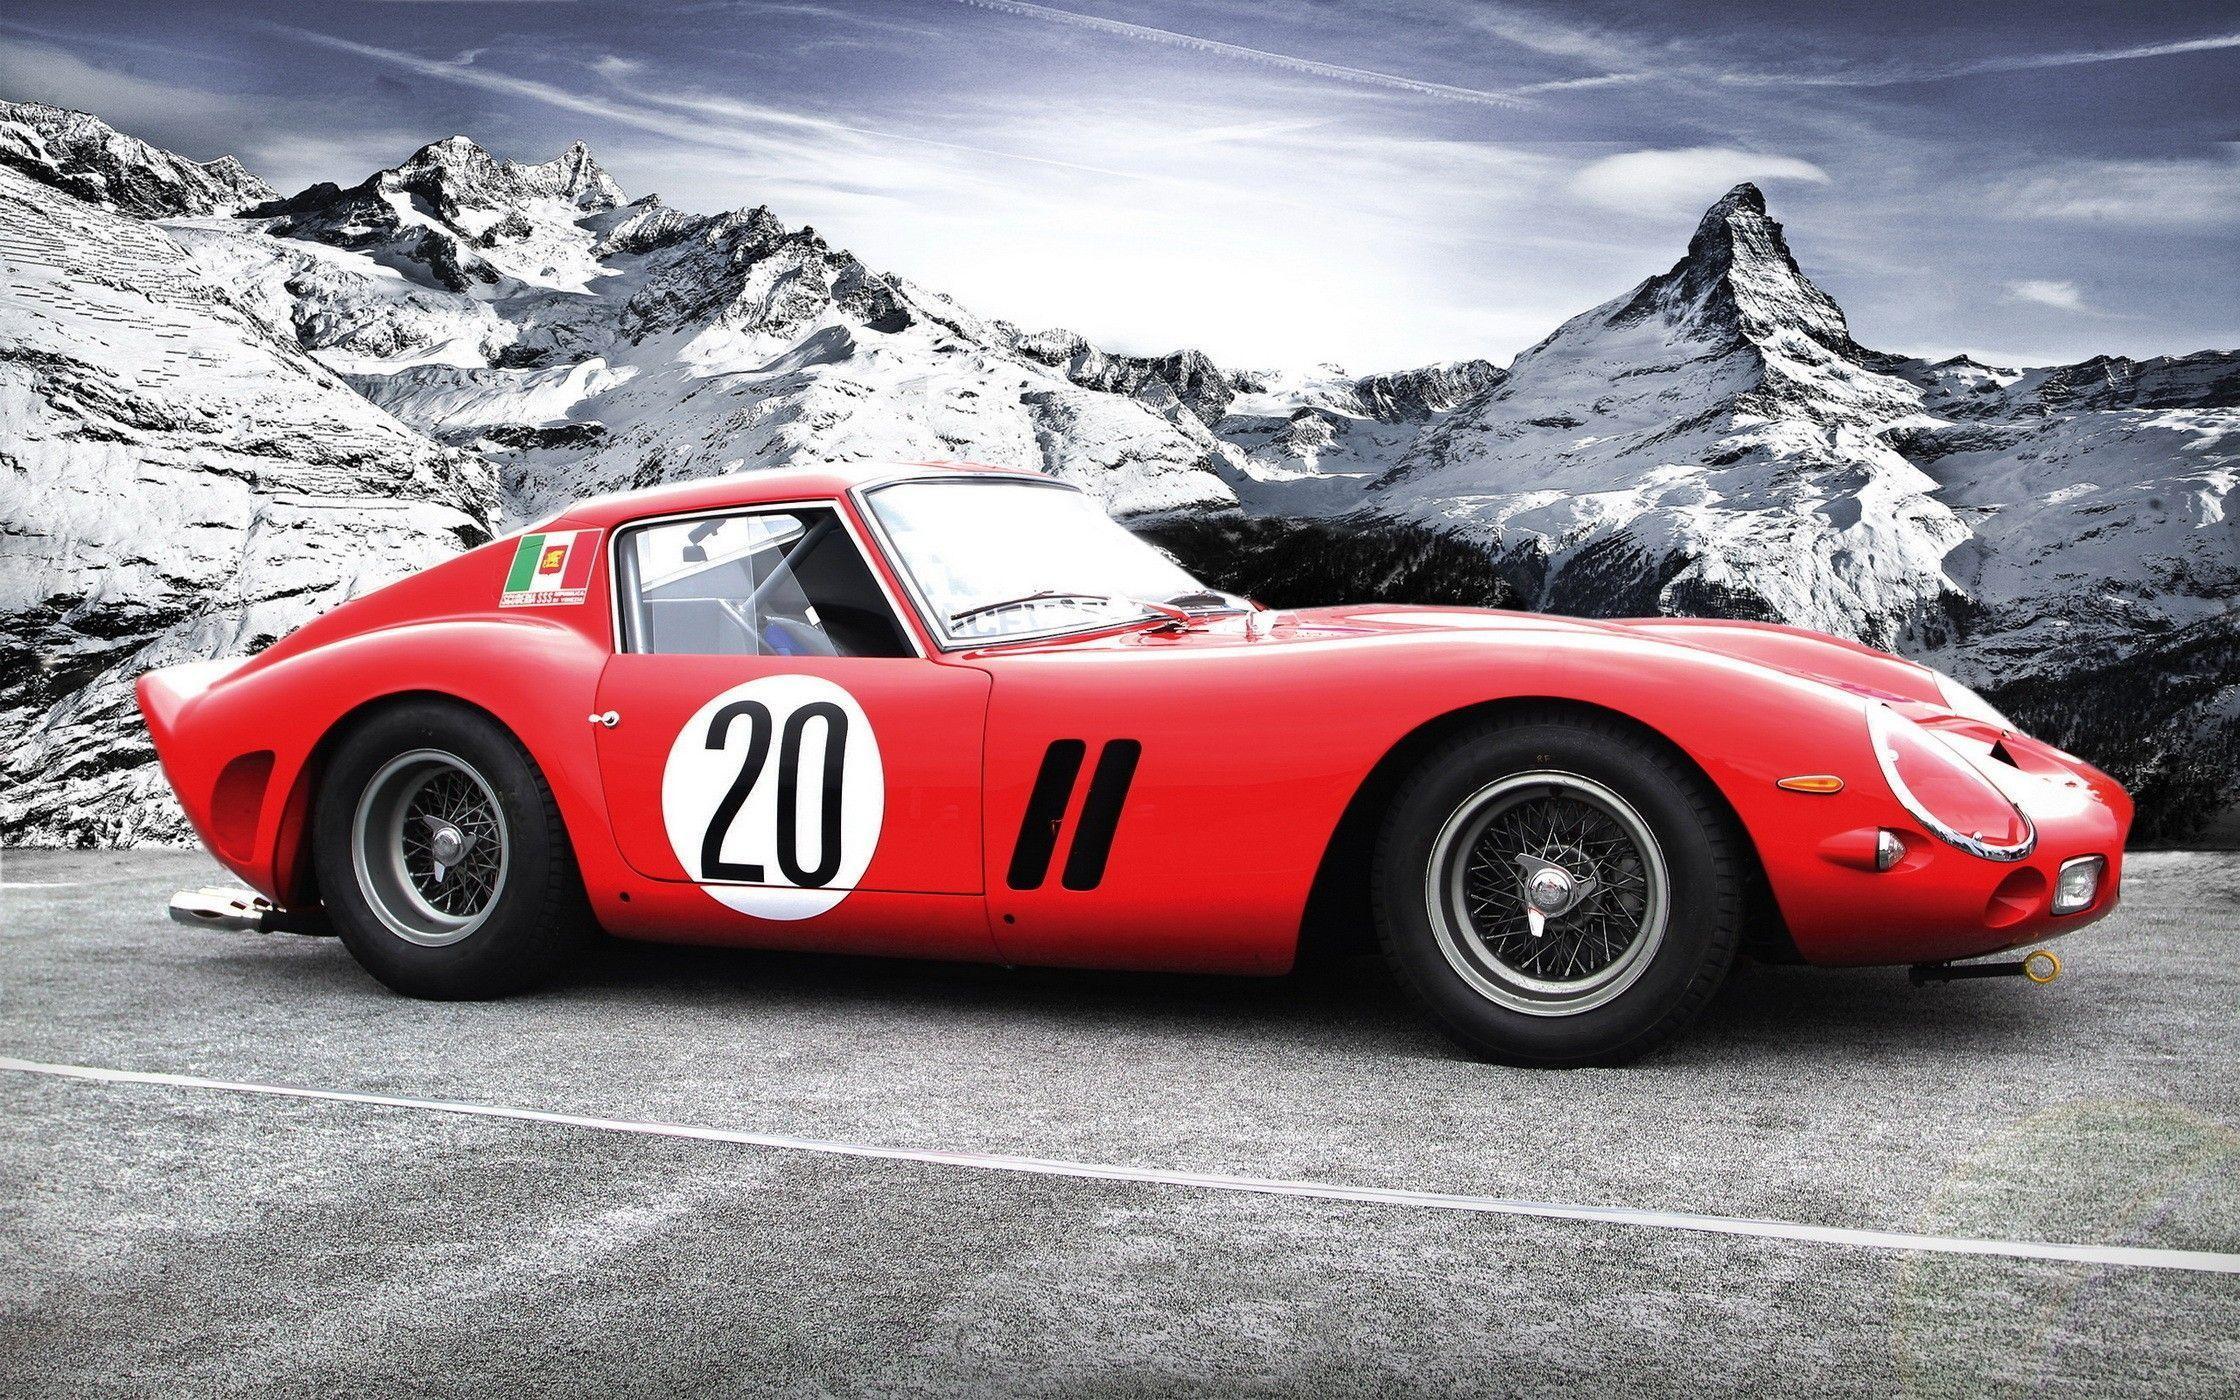 Ferrari 250 Gto Wallpapers Top Free Ferrari 250 Gto Backgrounds Wallpaperaccess